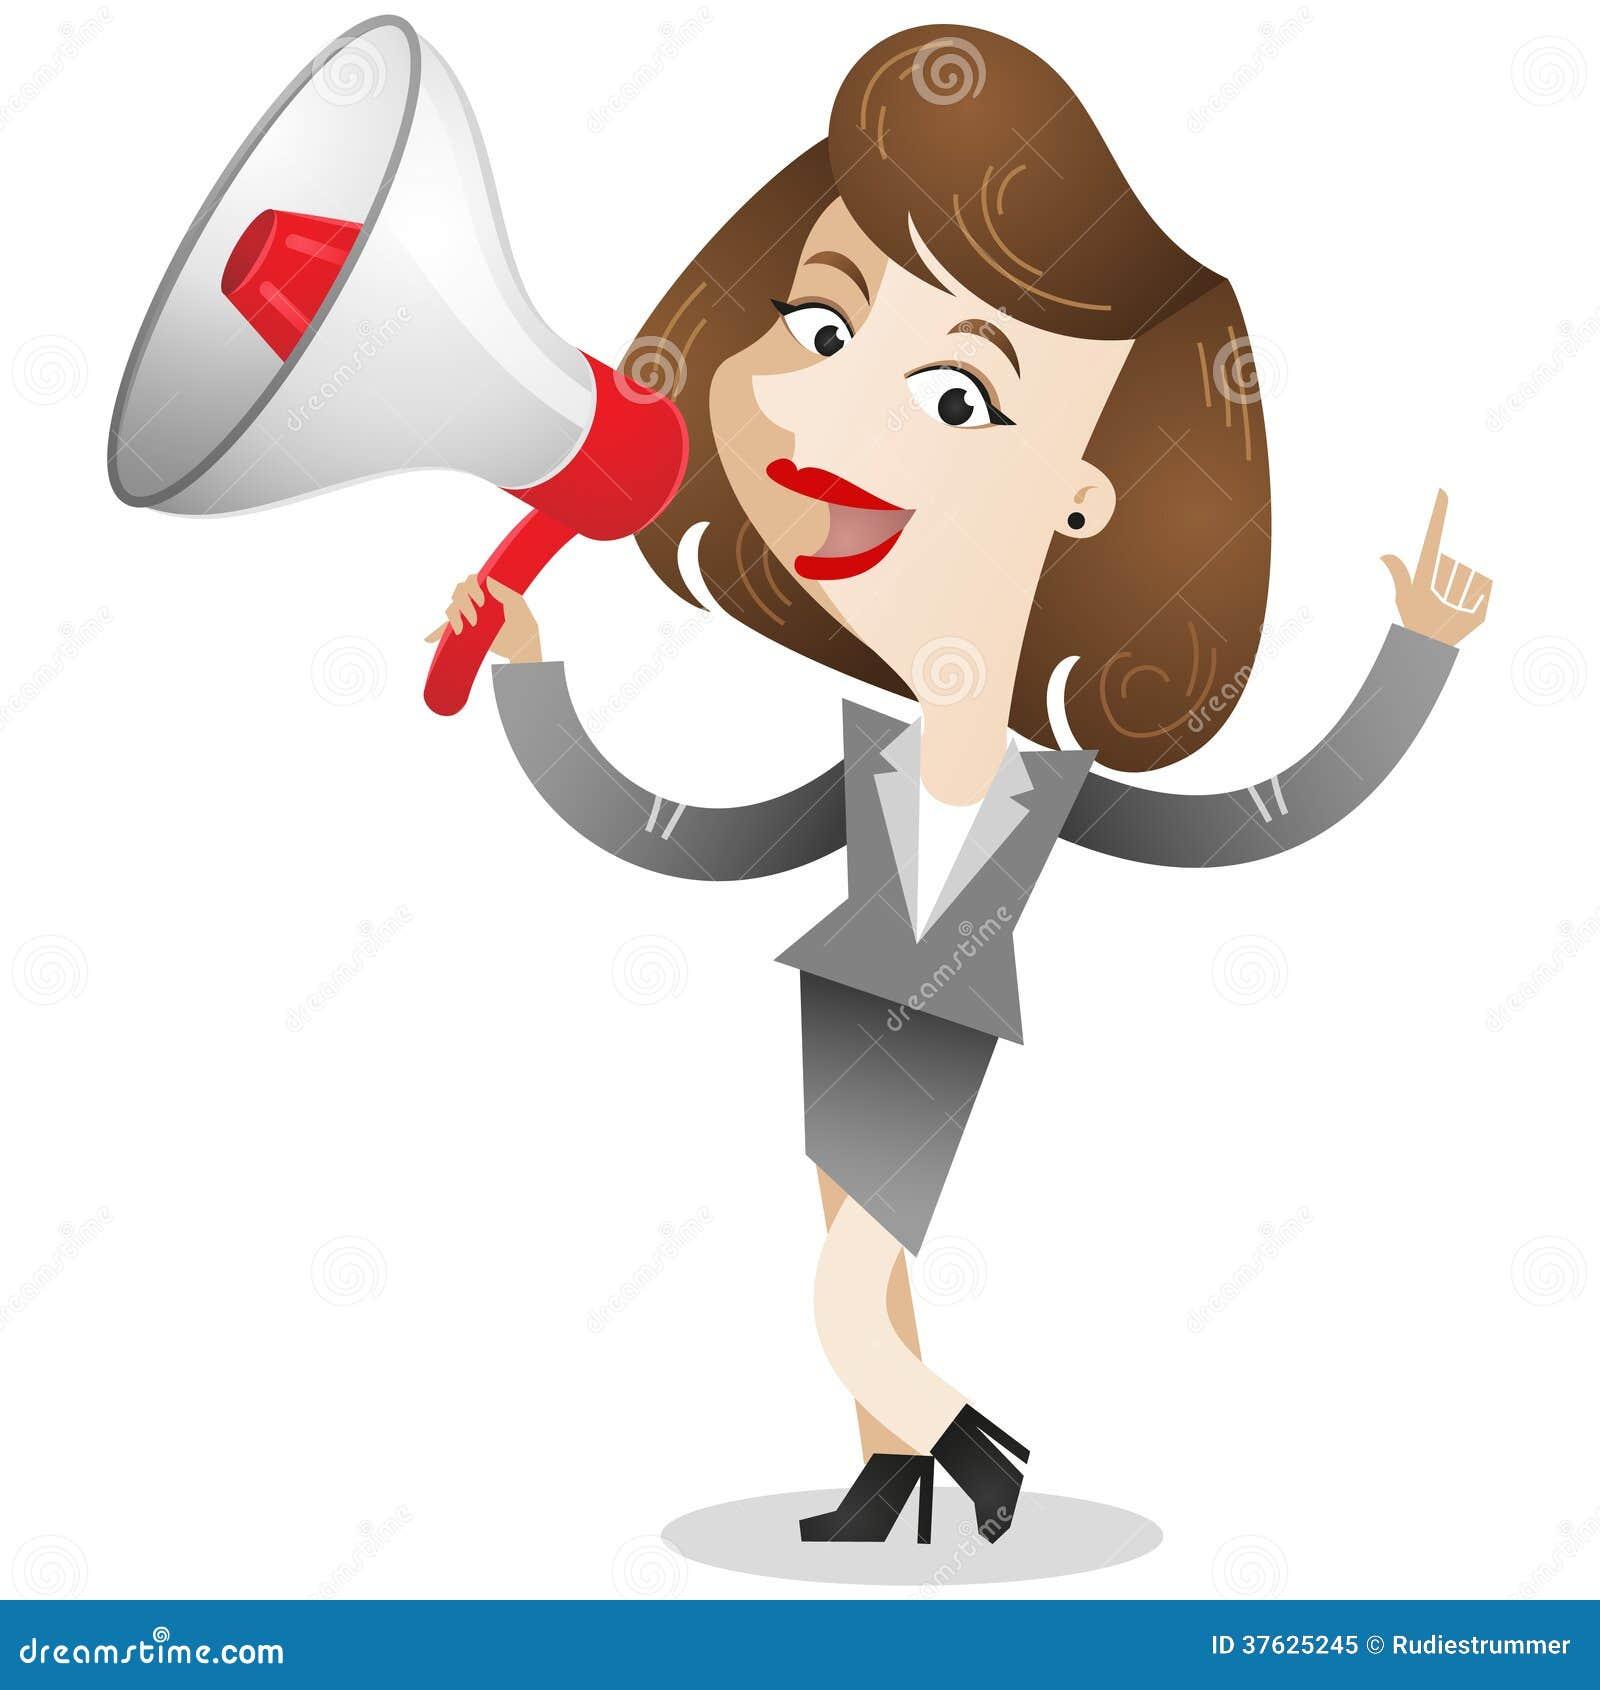 business-woman-megaphone-37625245.jpg